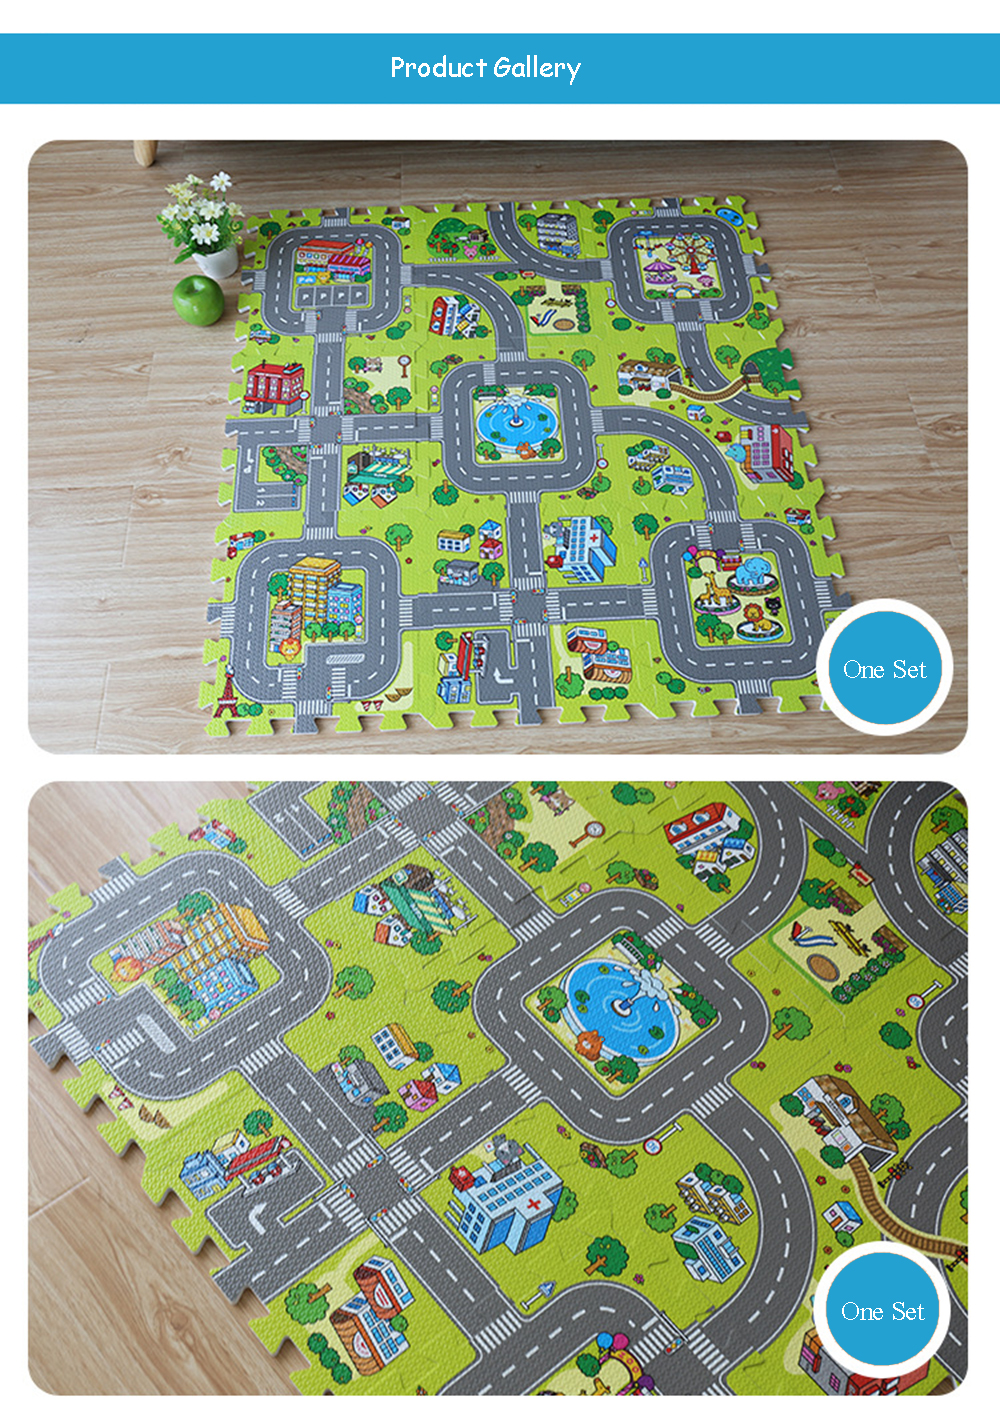 HTB1FuATdZLJ8KJjy0Fnq6AFDpXam Baby EVA Foam Puzzle Play Floor Mat City Road Education Carpets Interlocking Tiles Kids Traffic Route Ground Pad (No Edge) NEEU